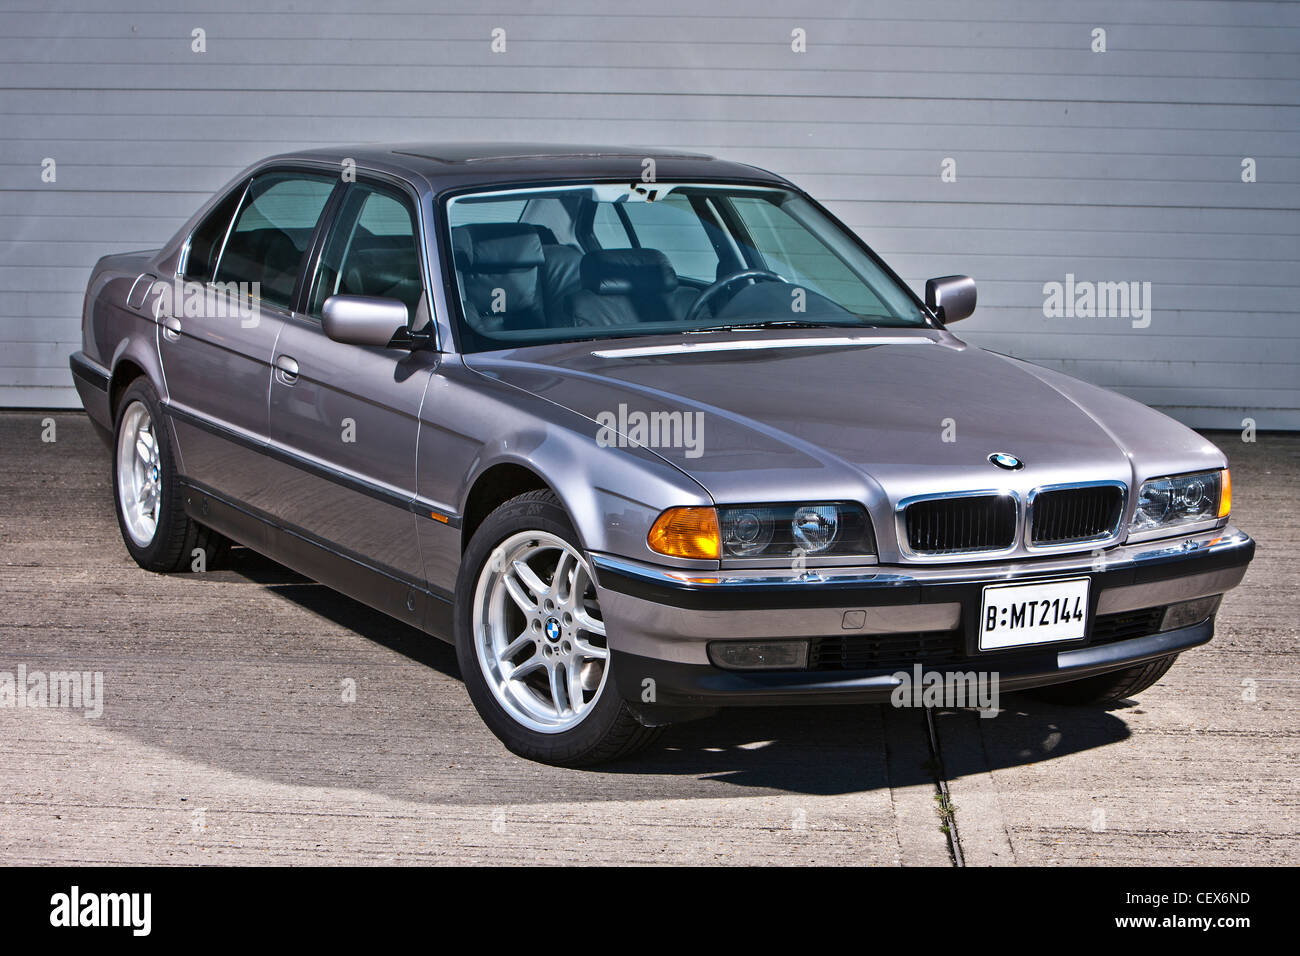 BMW 7 Series E38 Model, James Bond Classic Car   Stock Image